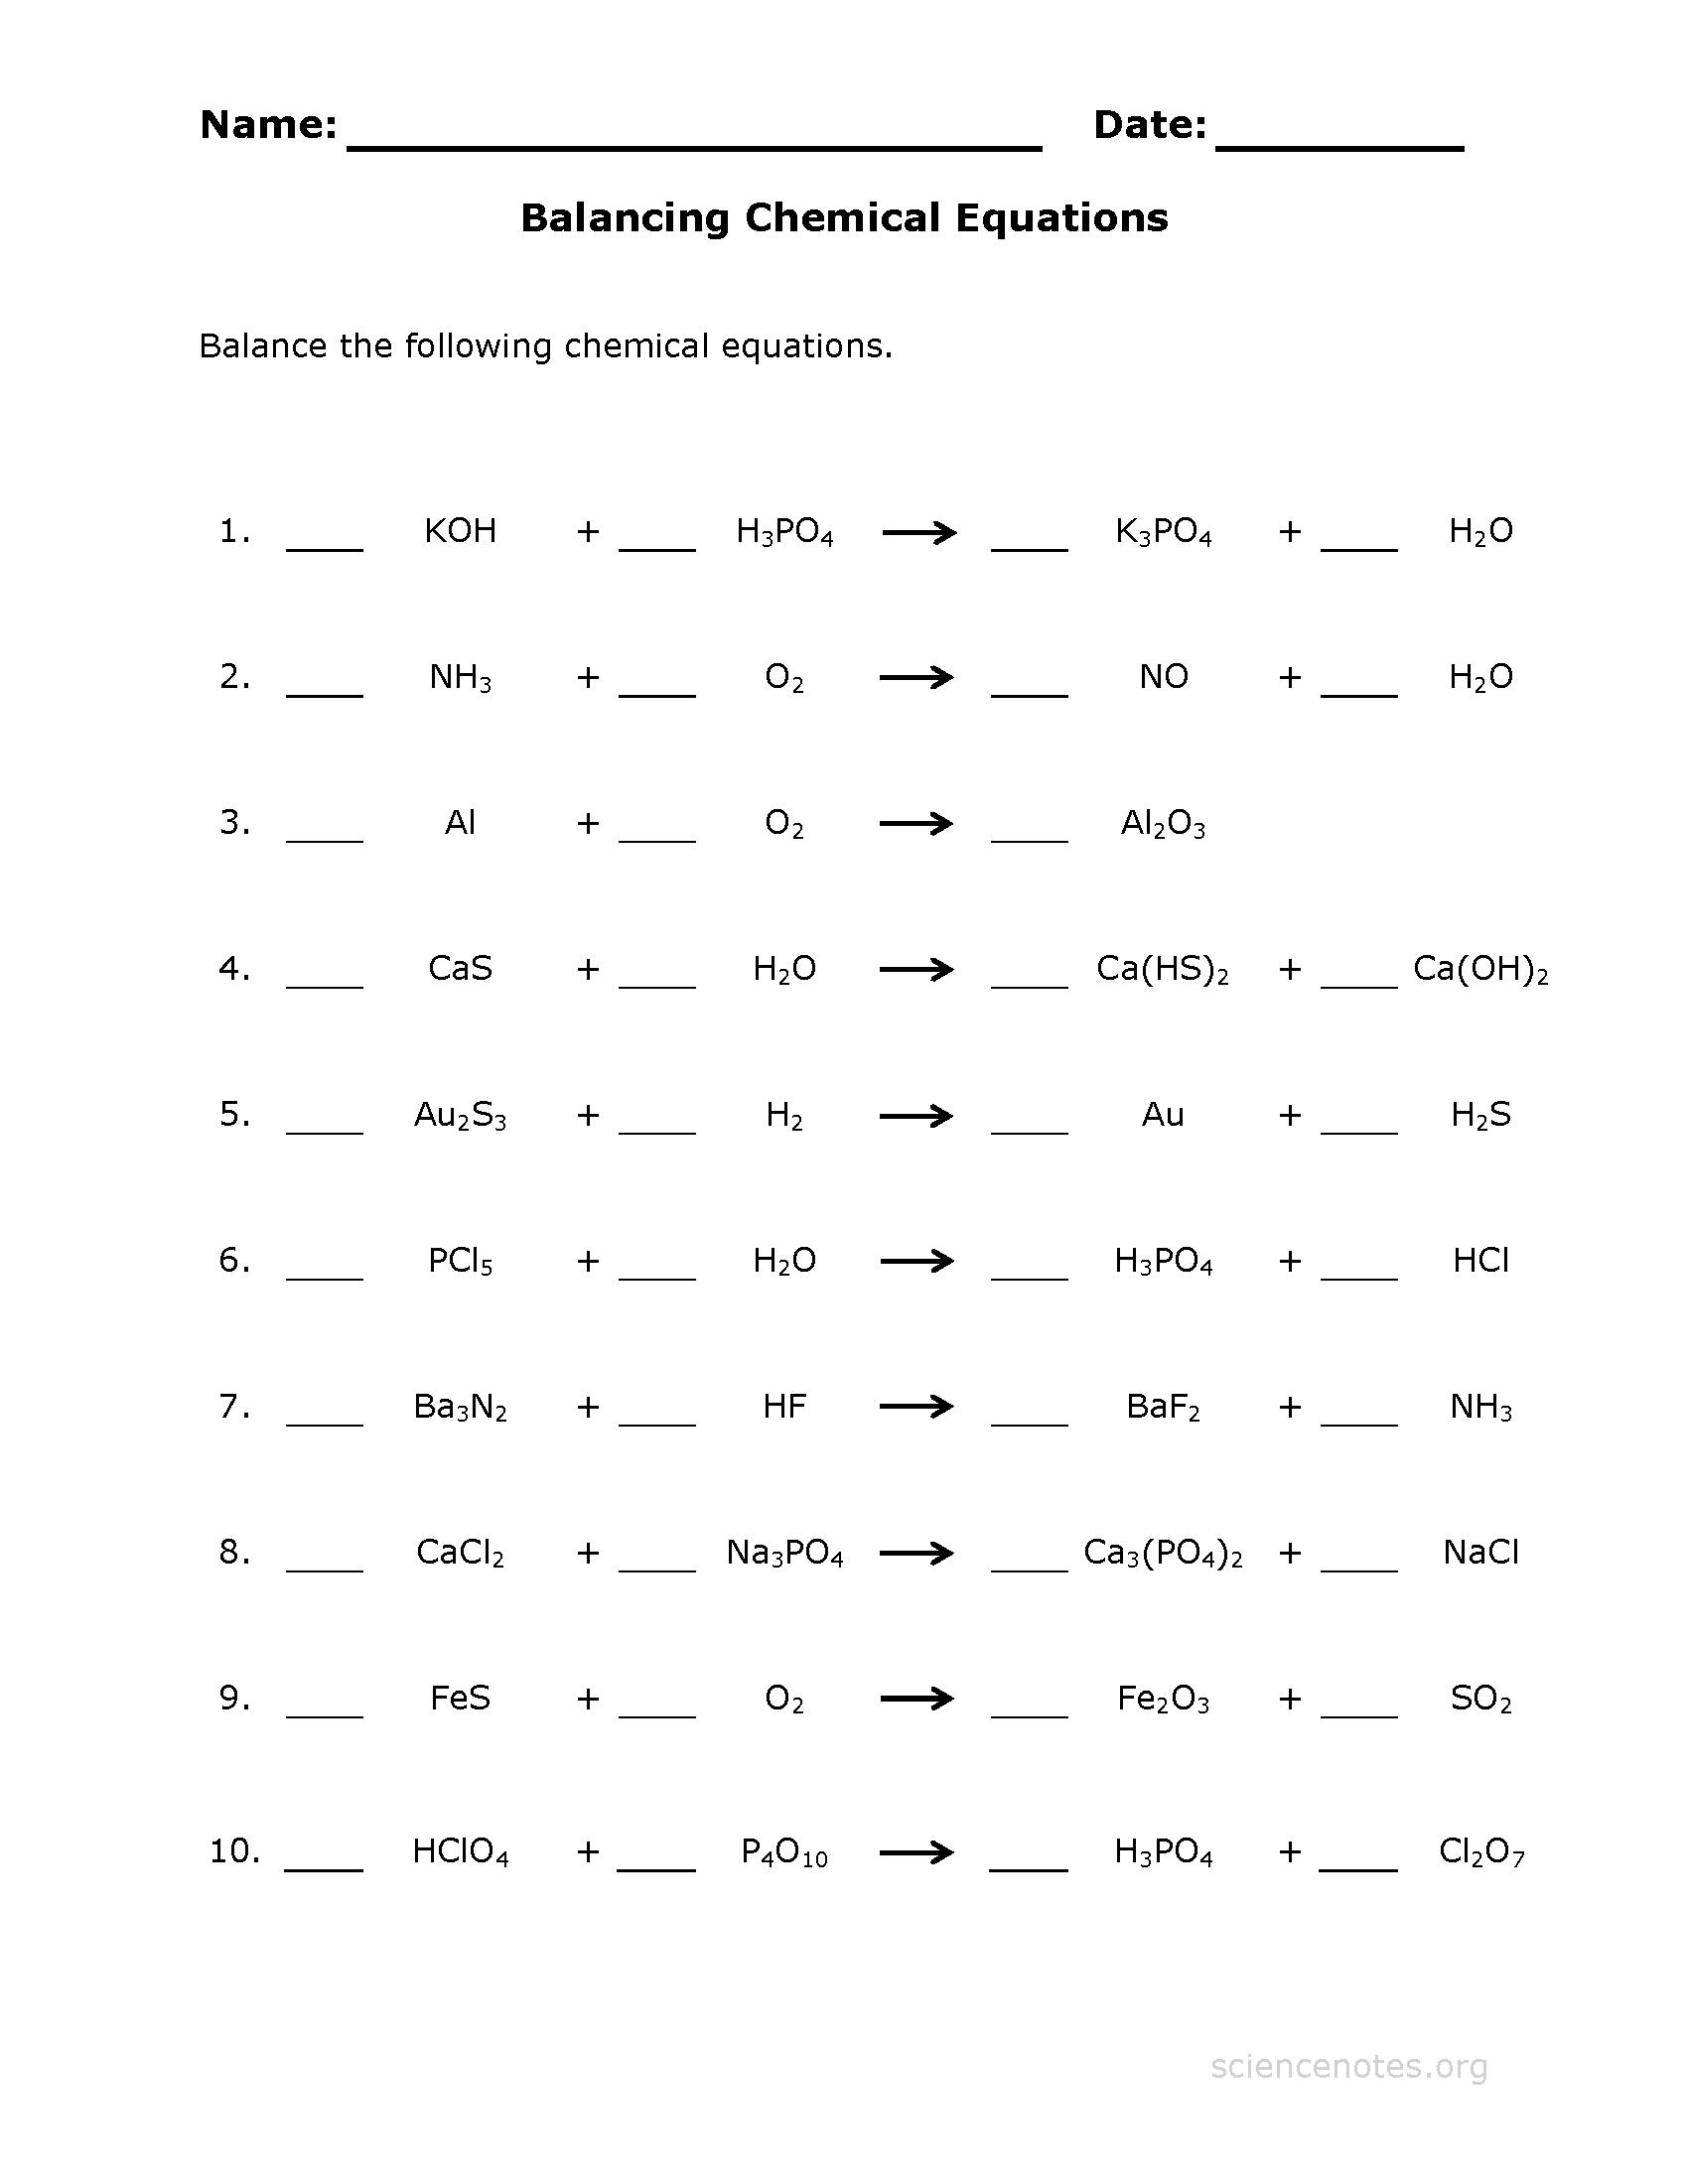 Balancing Chemical Equations Practice Worksheet